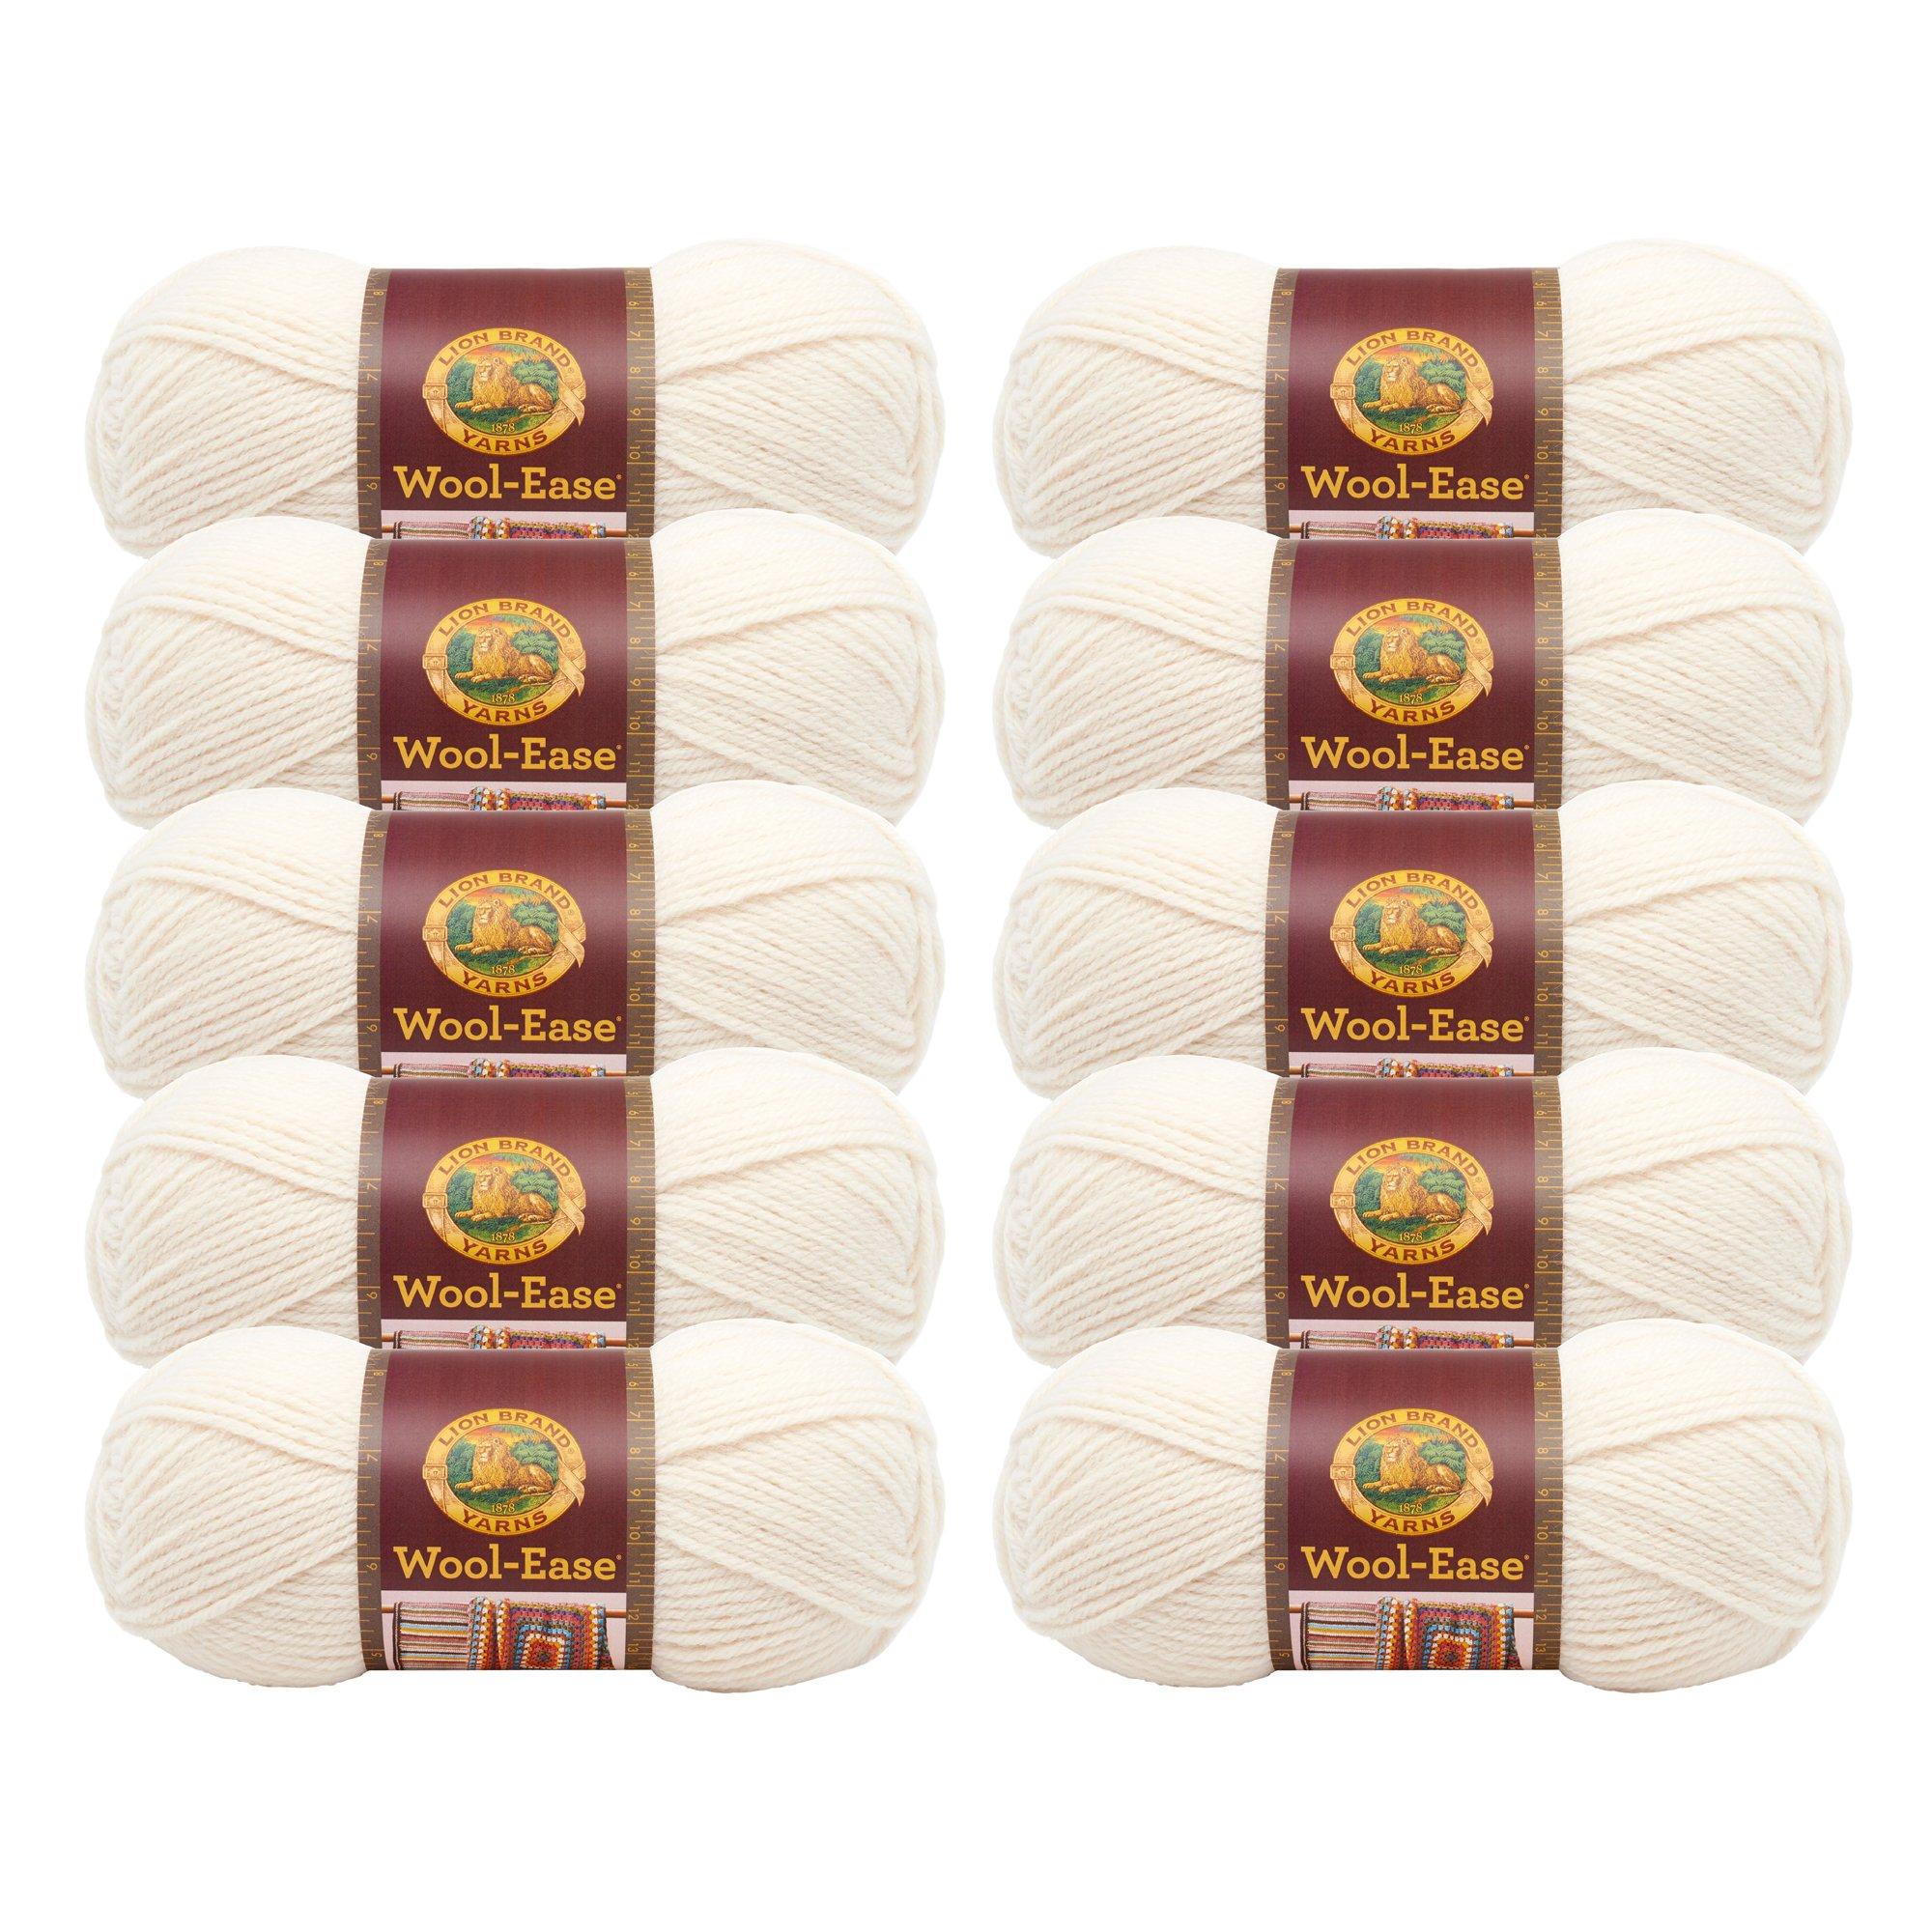 (10 Pack) Lion Brand Yarn 620-099 Wool-Ease Yarn, Fisherman